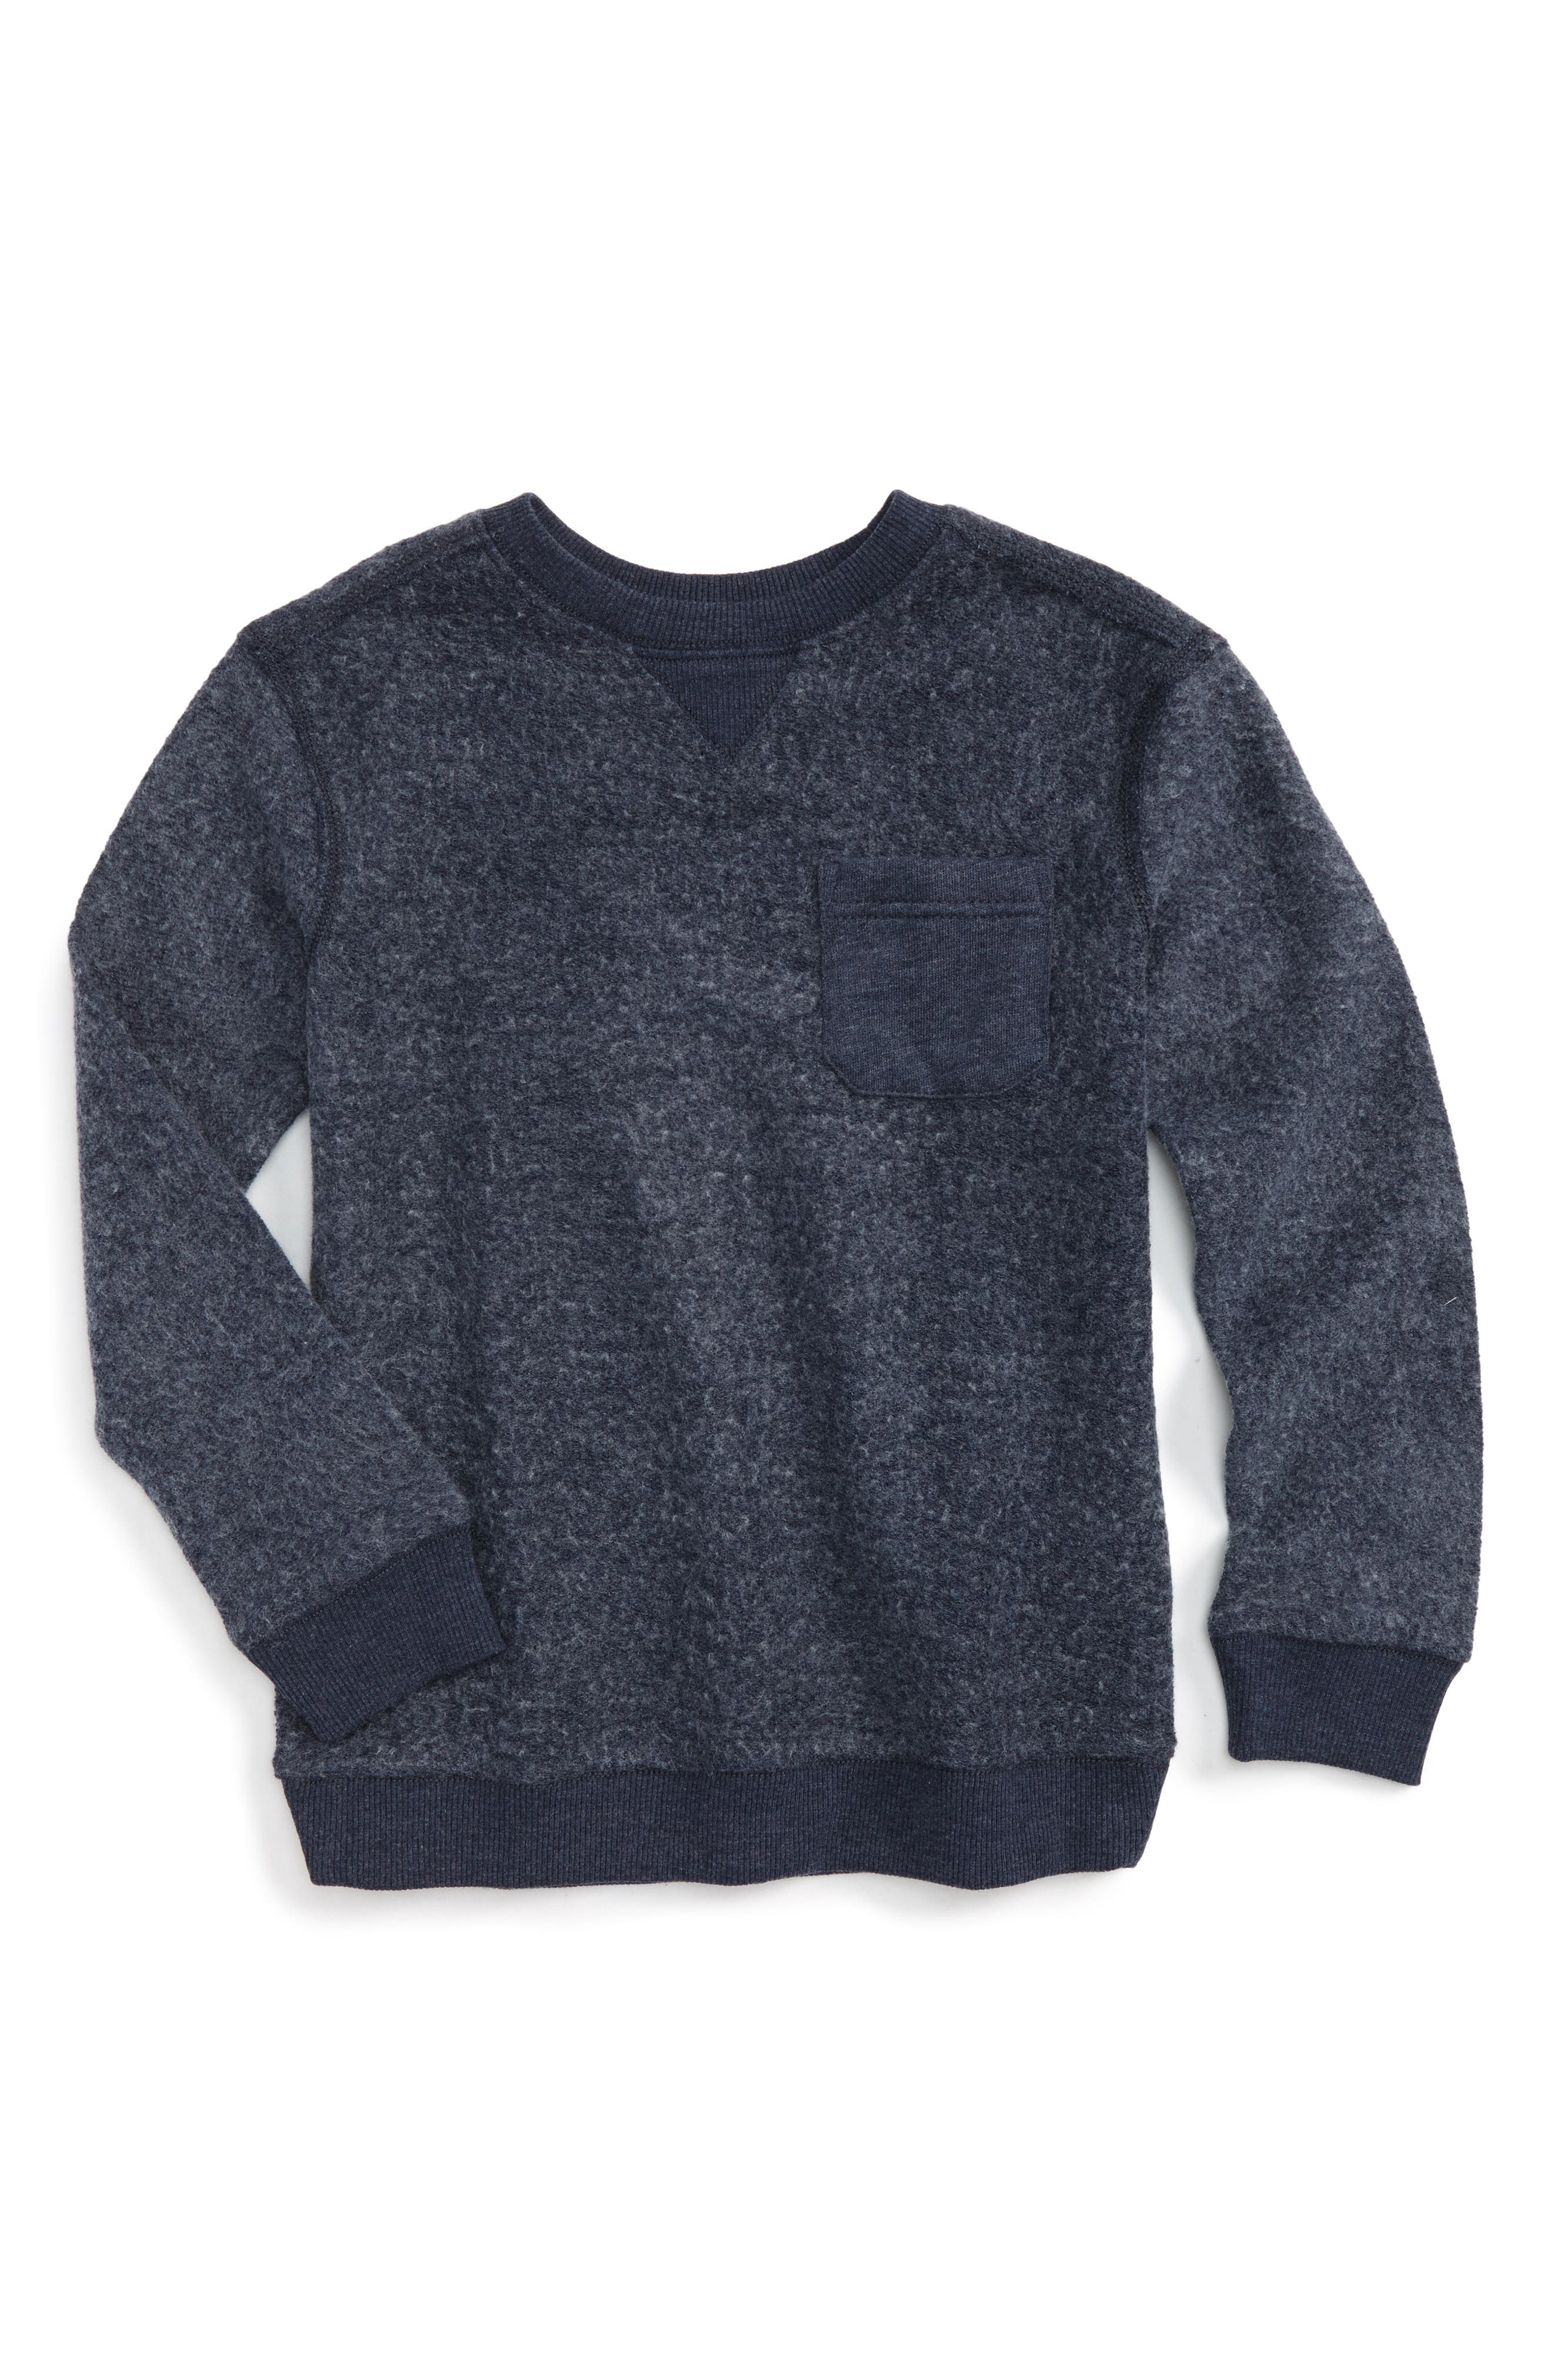 Main Image - Tucker + Tate Fleece Sweatshirt (Toddler Boys & Little Boys)